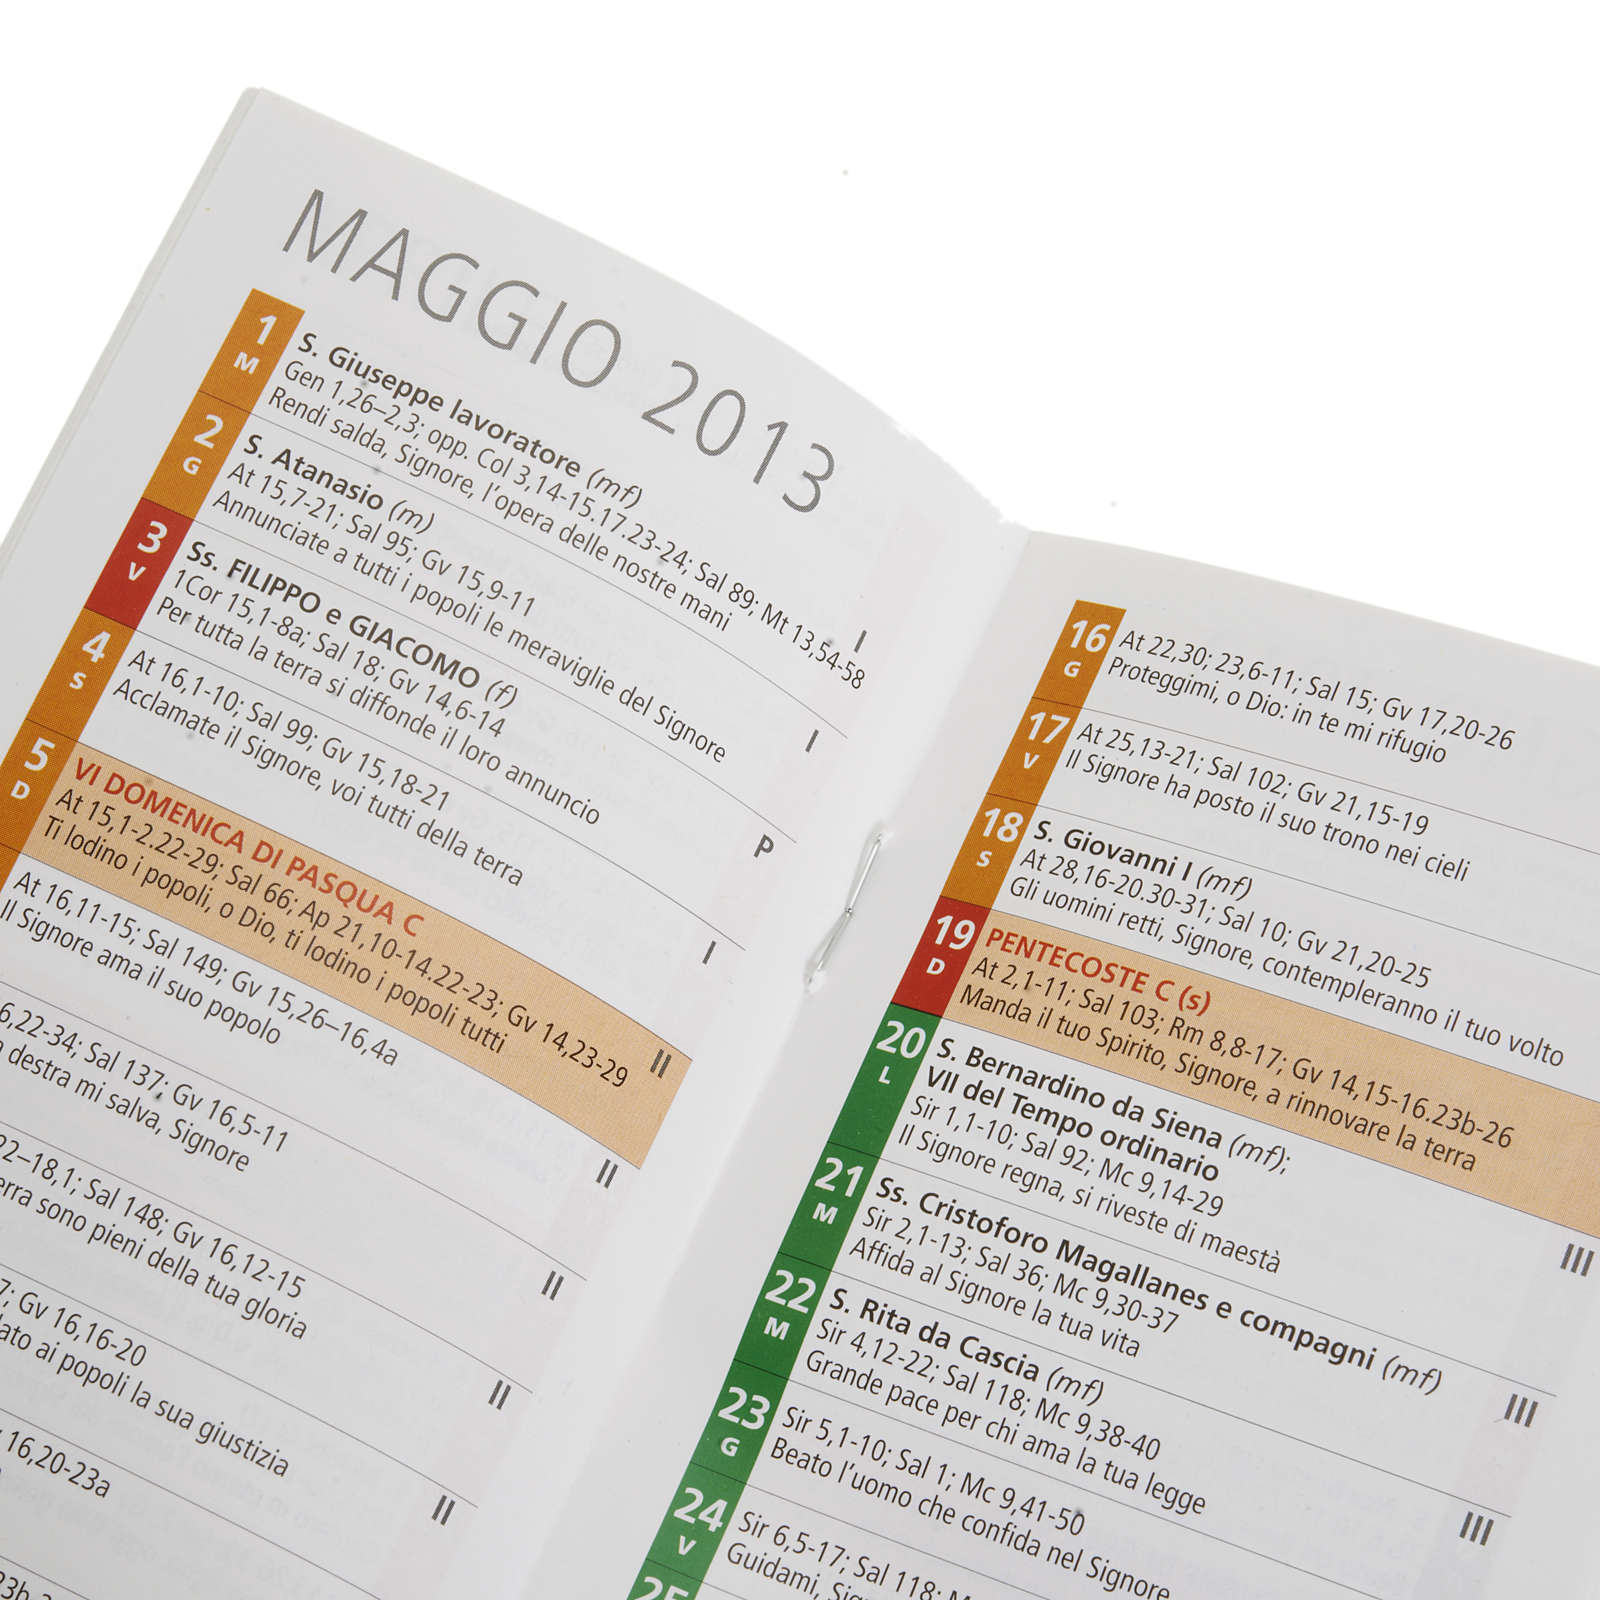 Calendario 2013 Liturgia della Parola 4